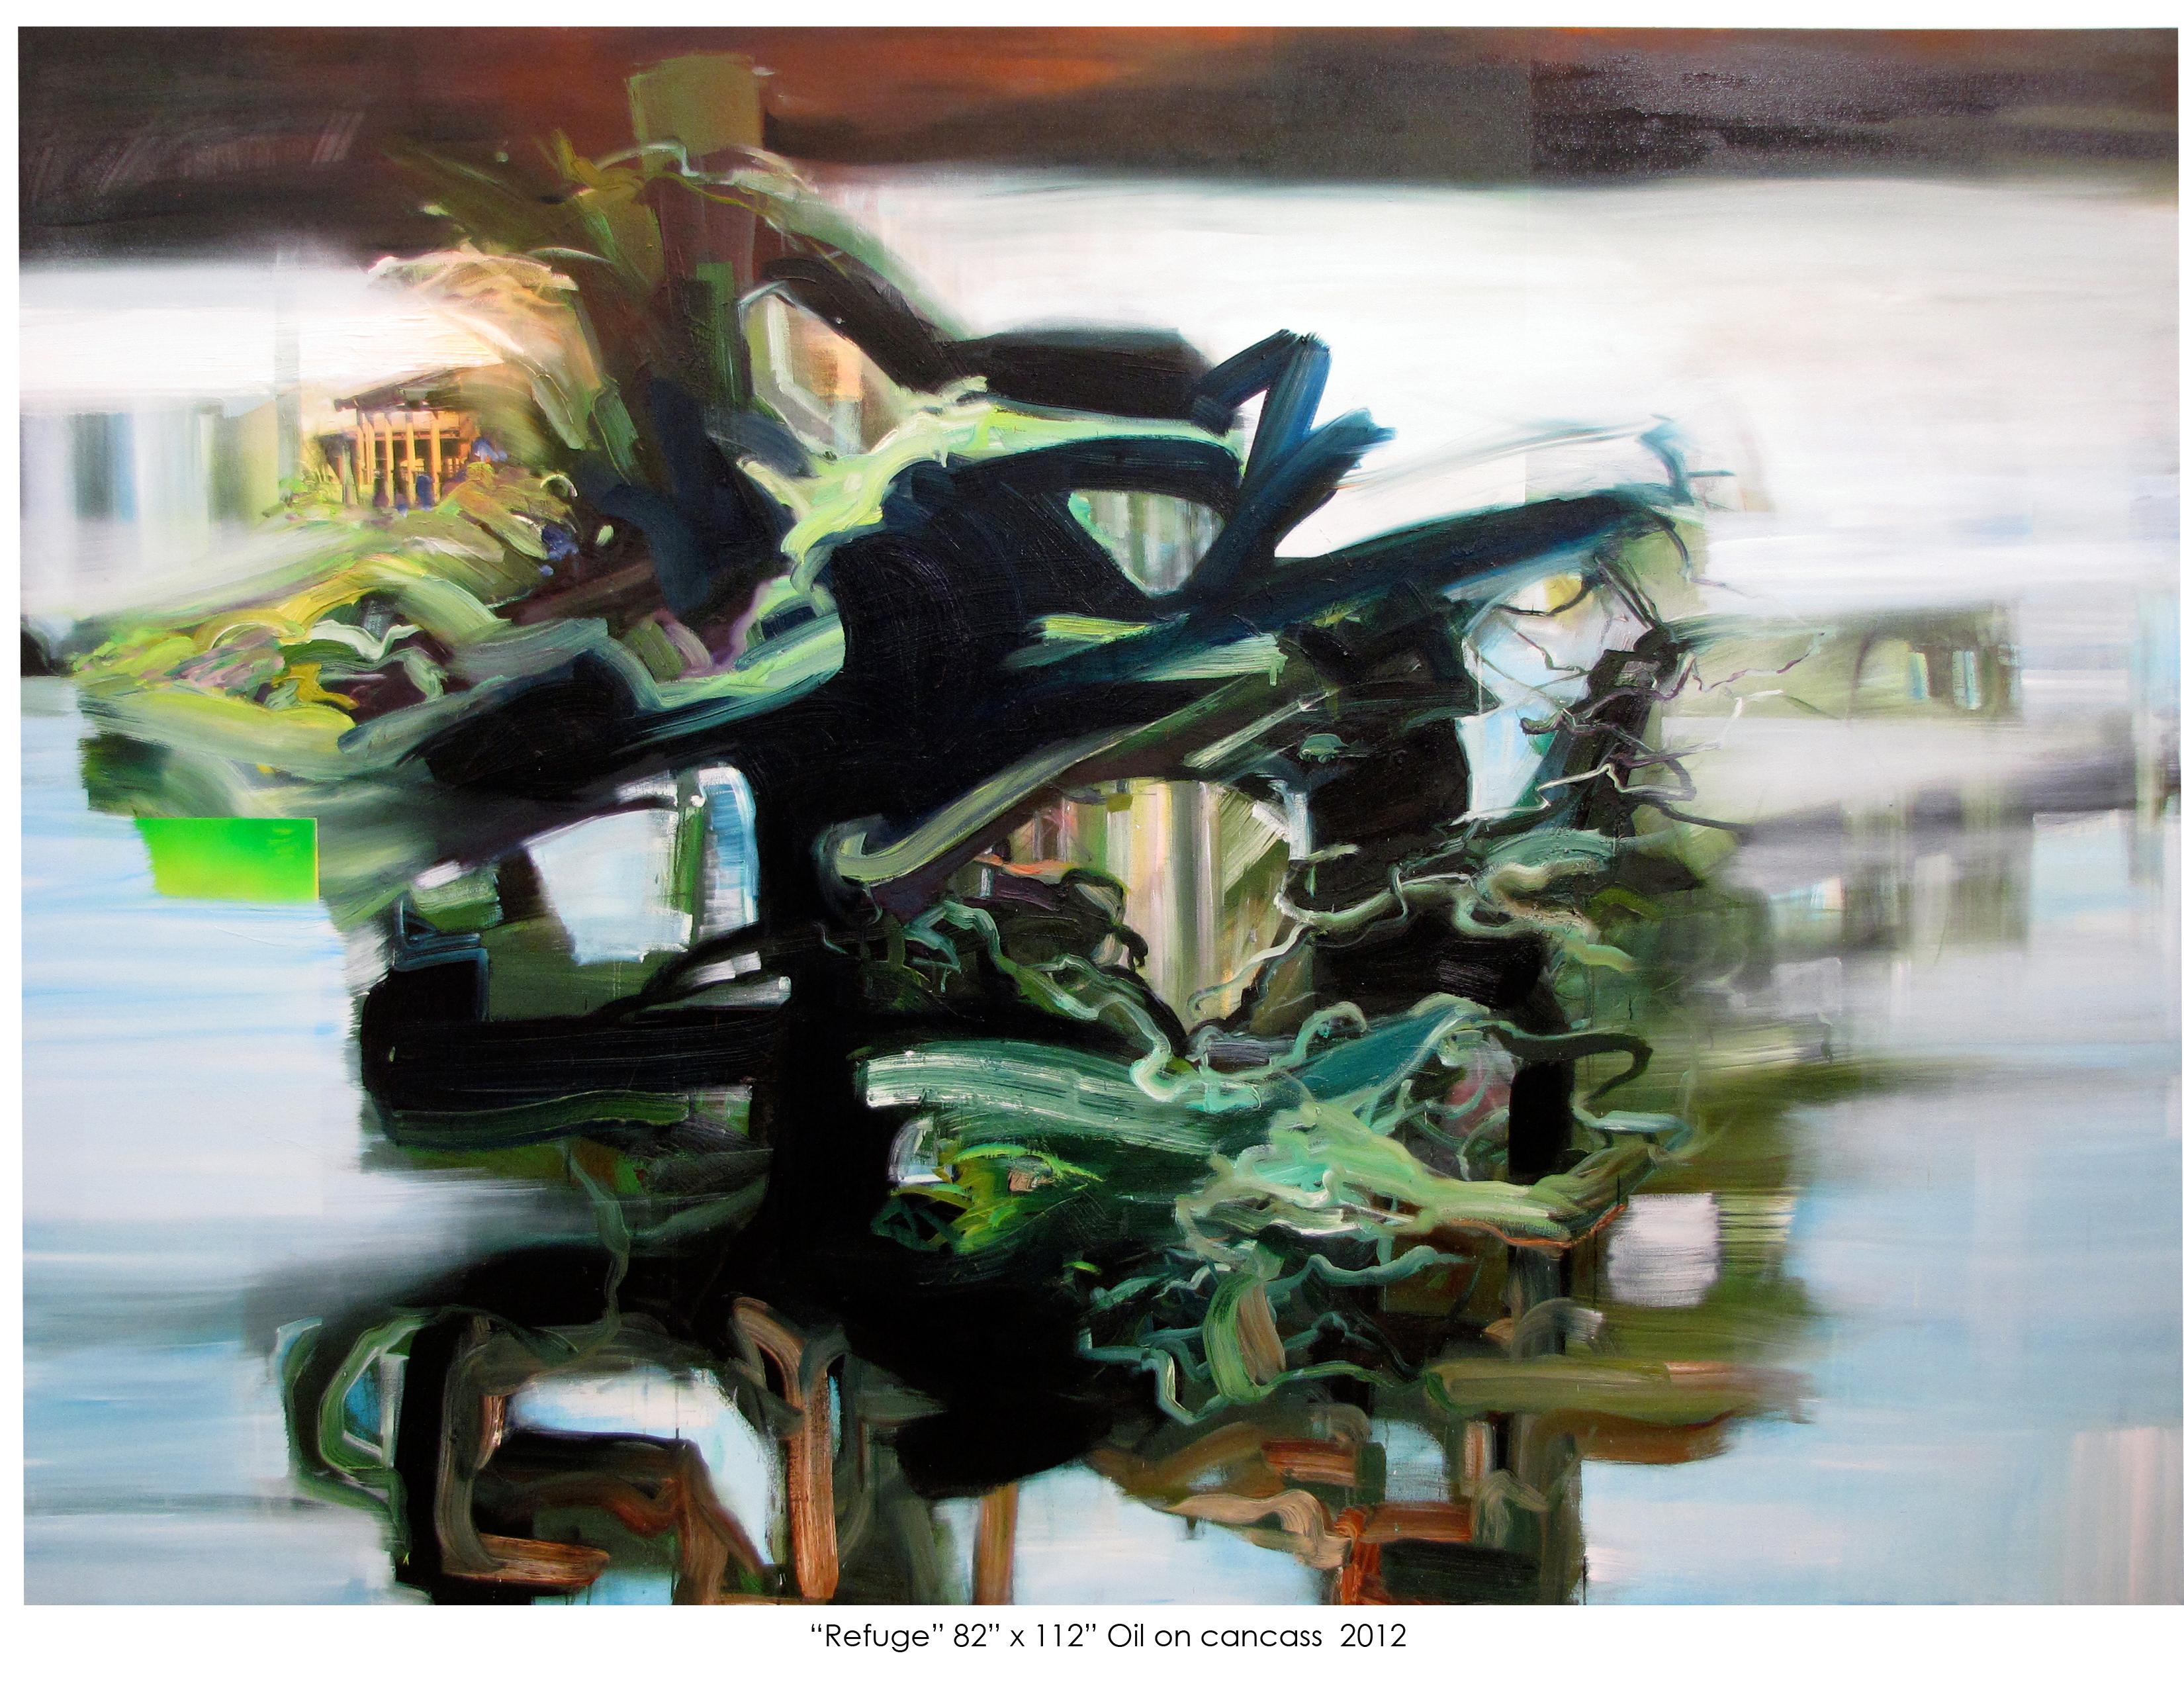 "Refuge 82"" x 112"" Oil on cancass 2012"